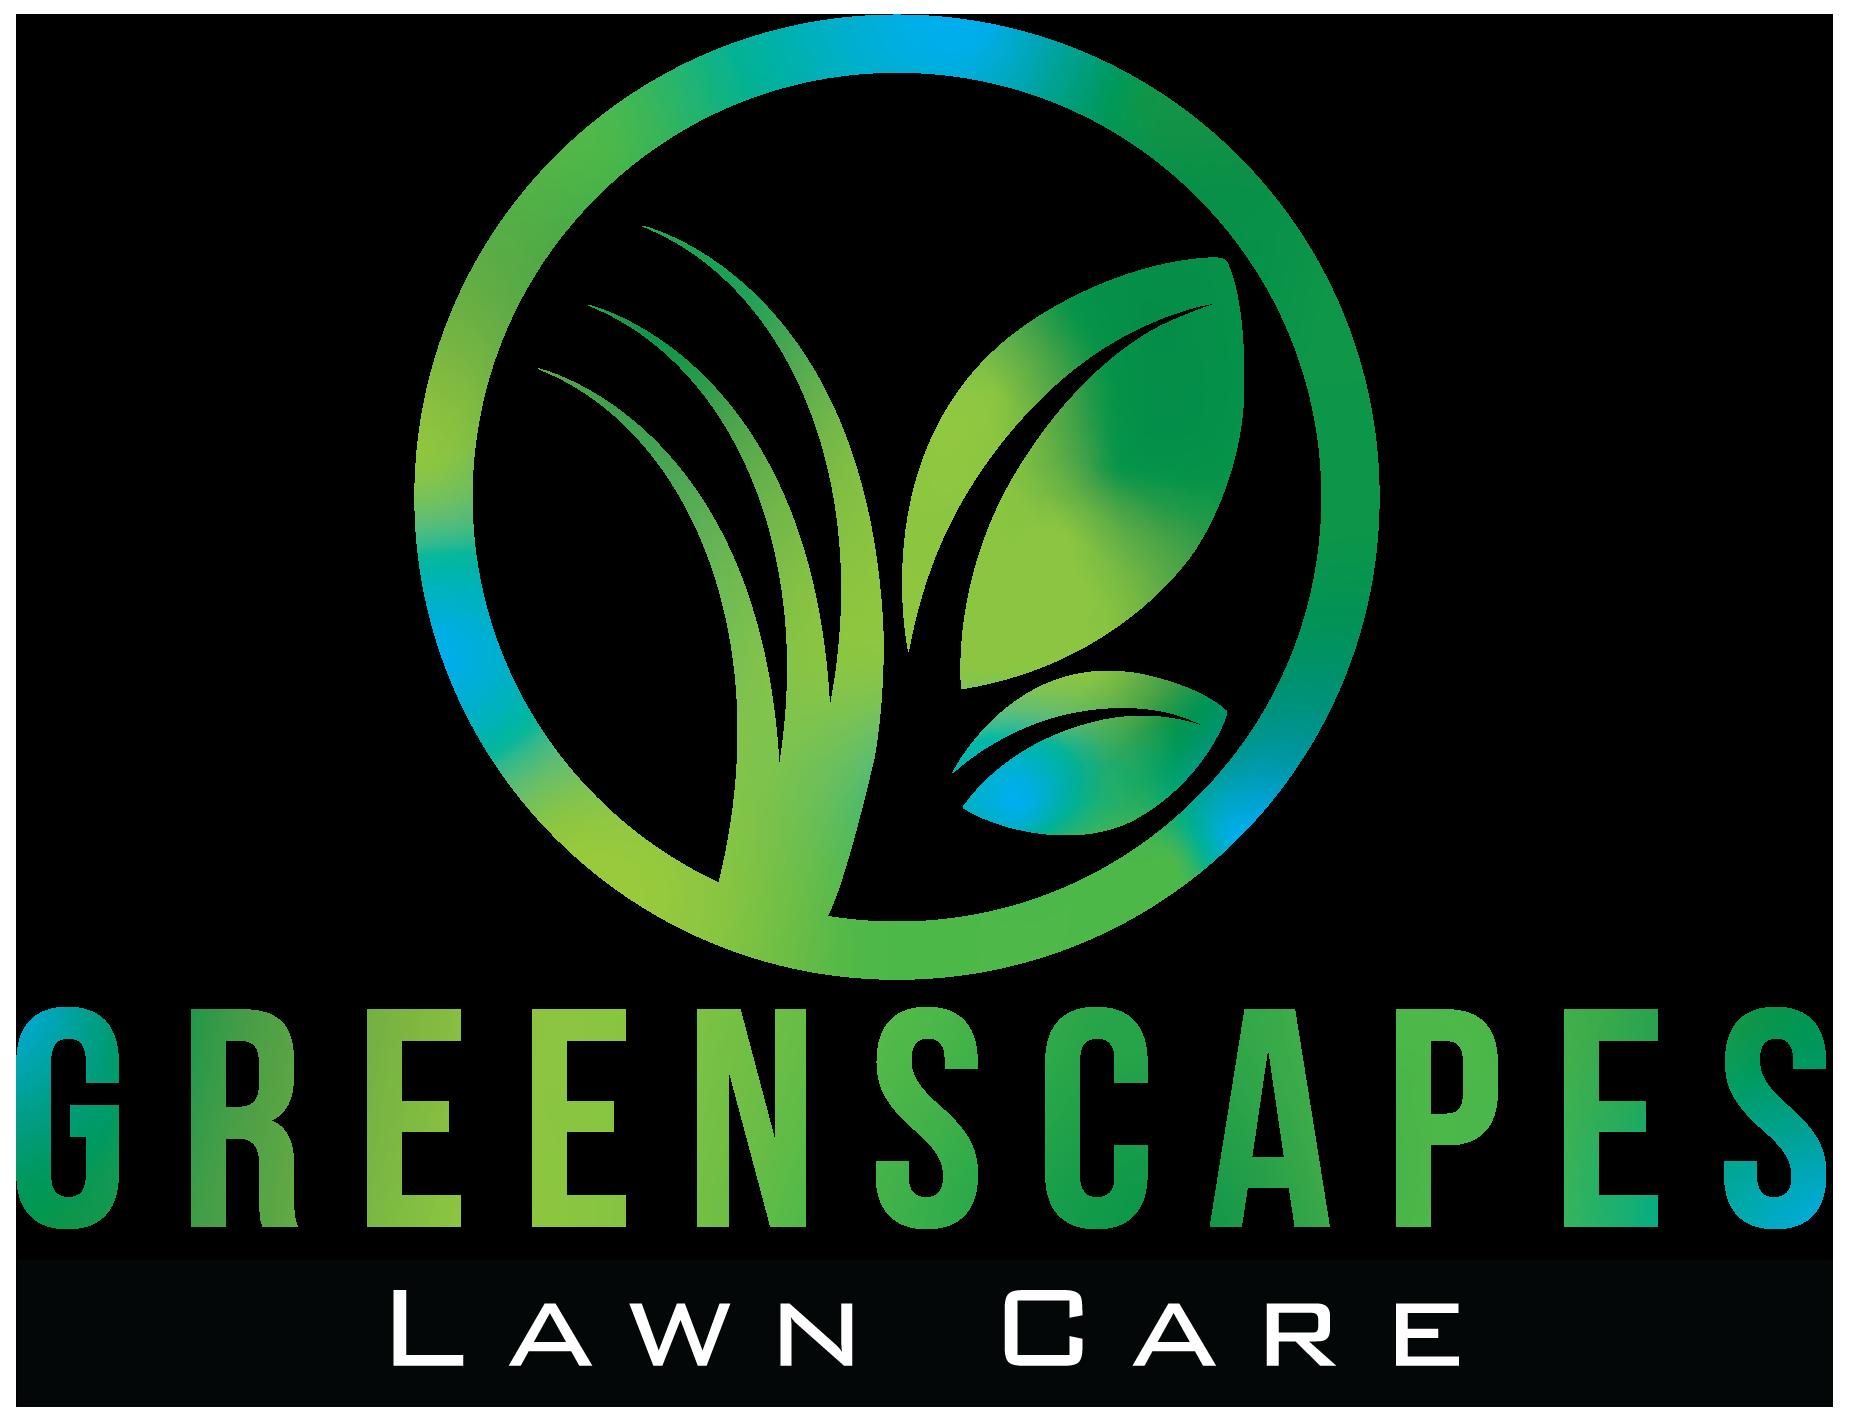 Greenscapes Lawn Care